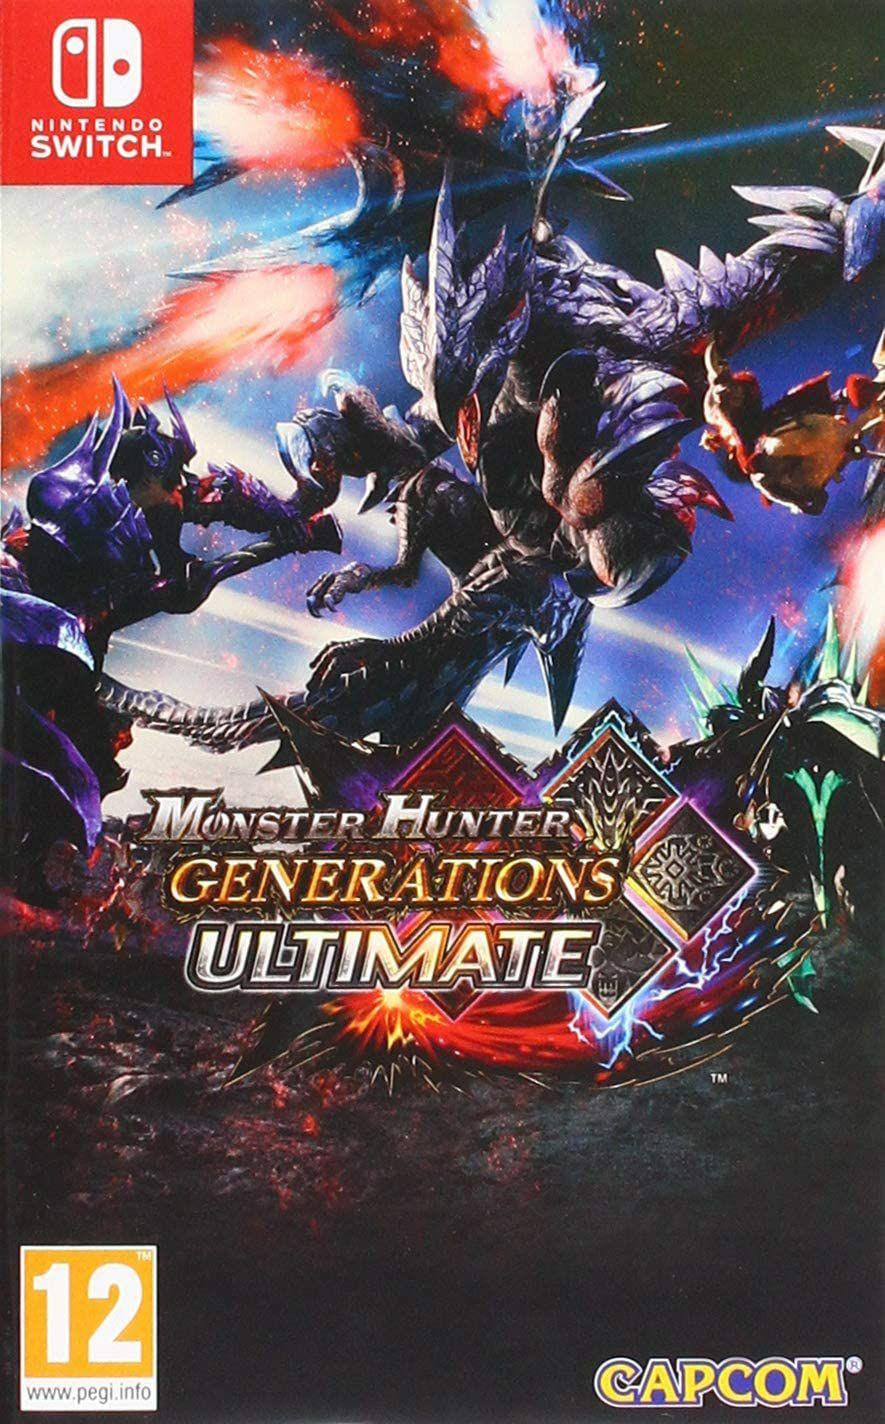 Monster Hunter Generations Ultimate Nintendo Switch £17.99 e-shop/Digitial